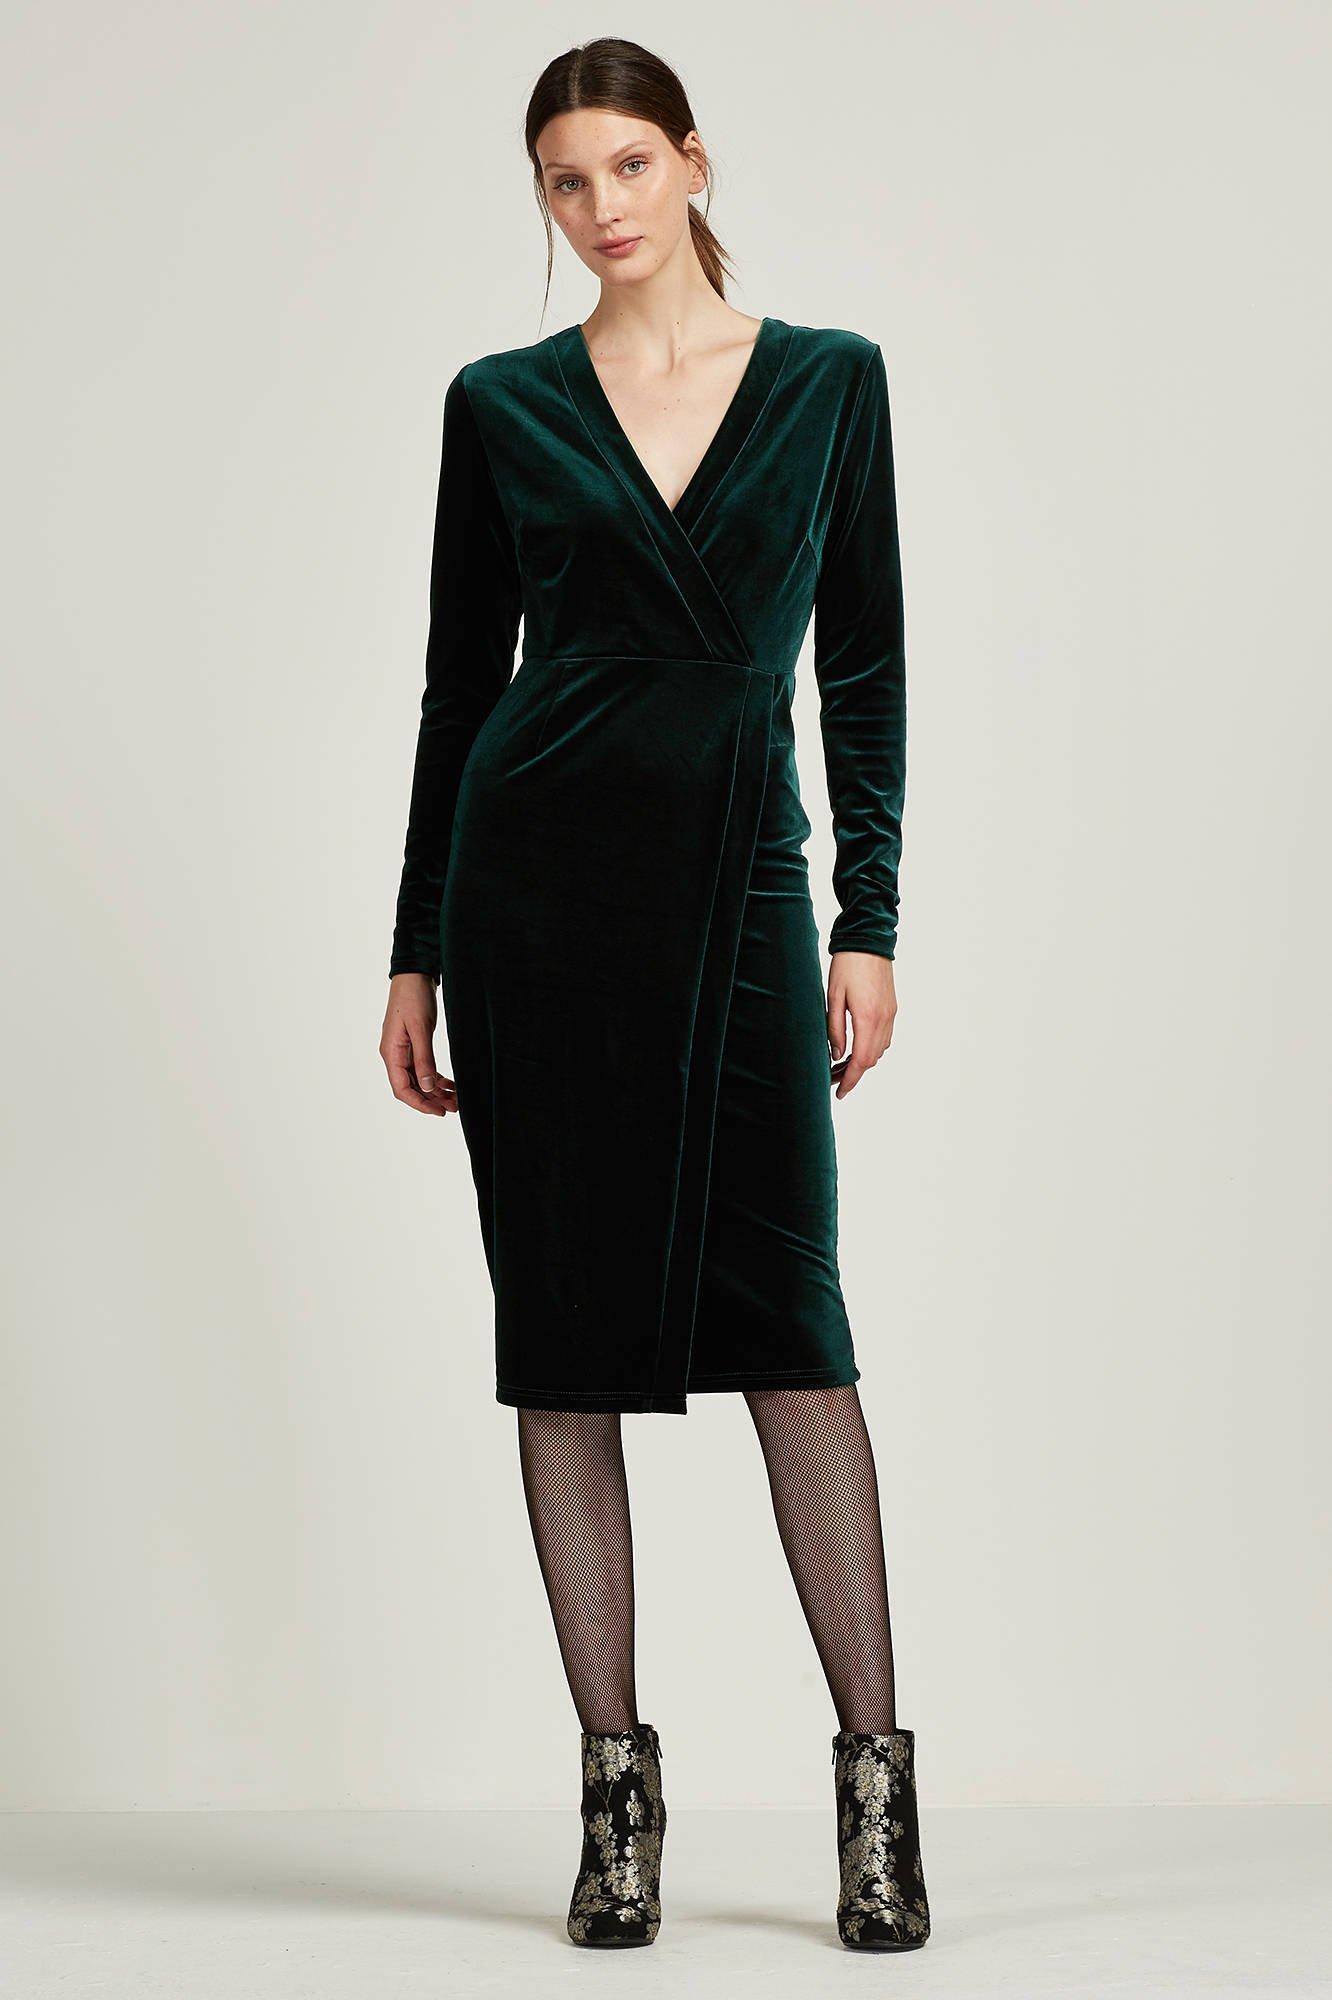 groene fluwelen jurk